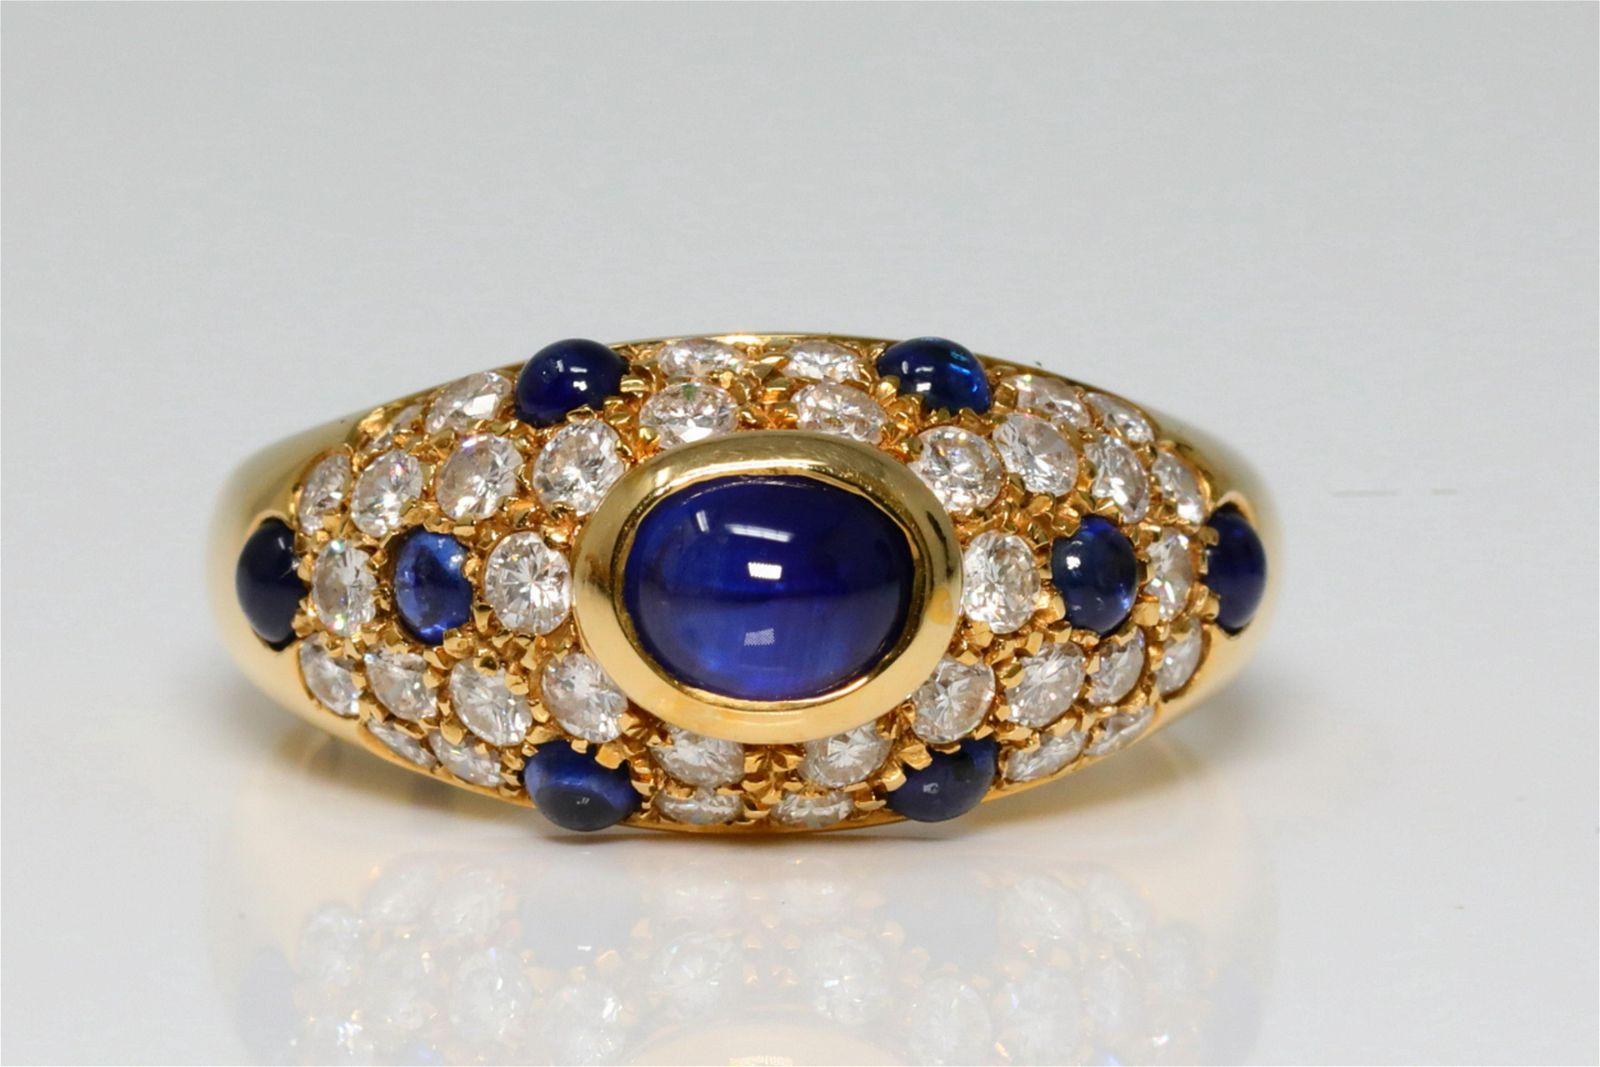 Cartier 2.25ctw Blue Sapphire & Diamond 18K Ring